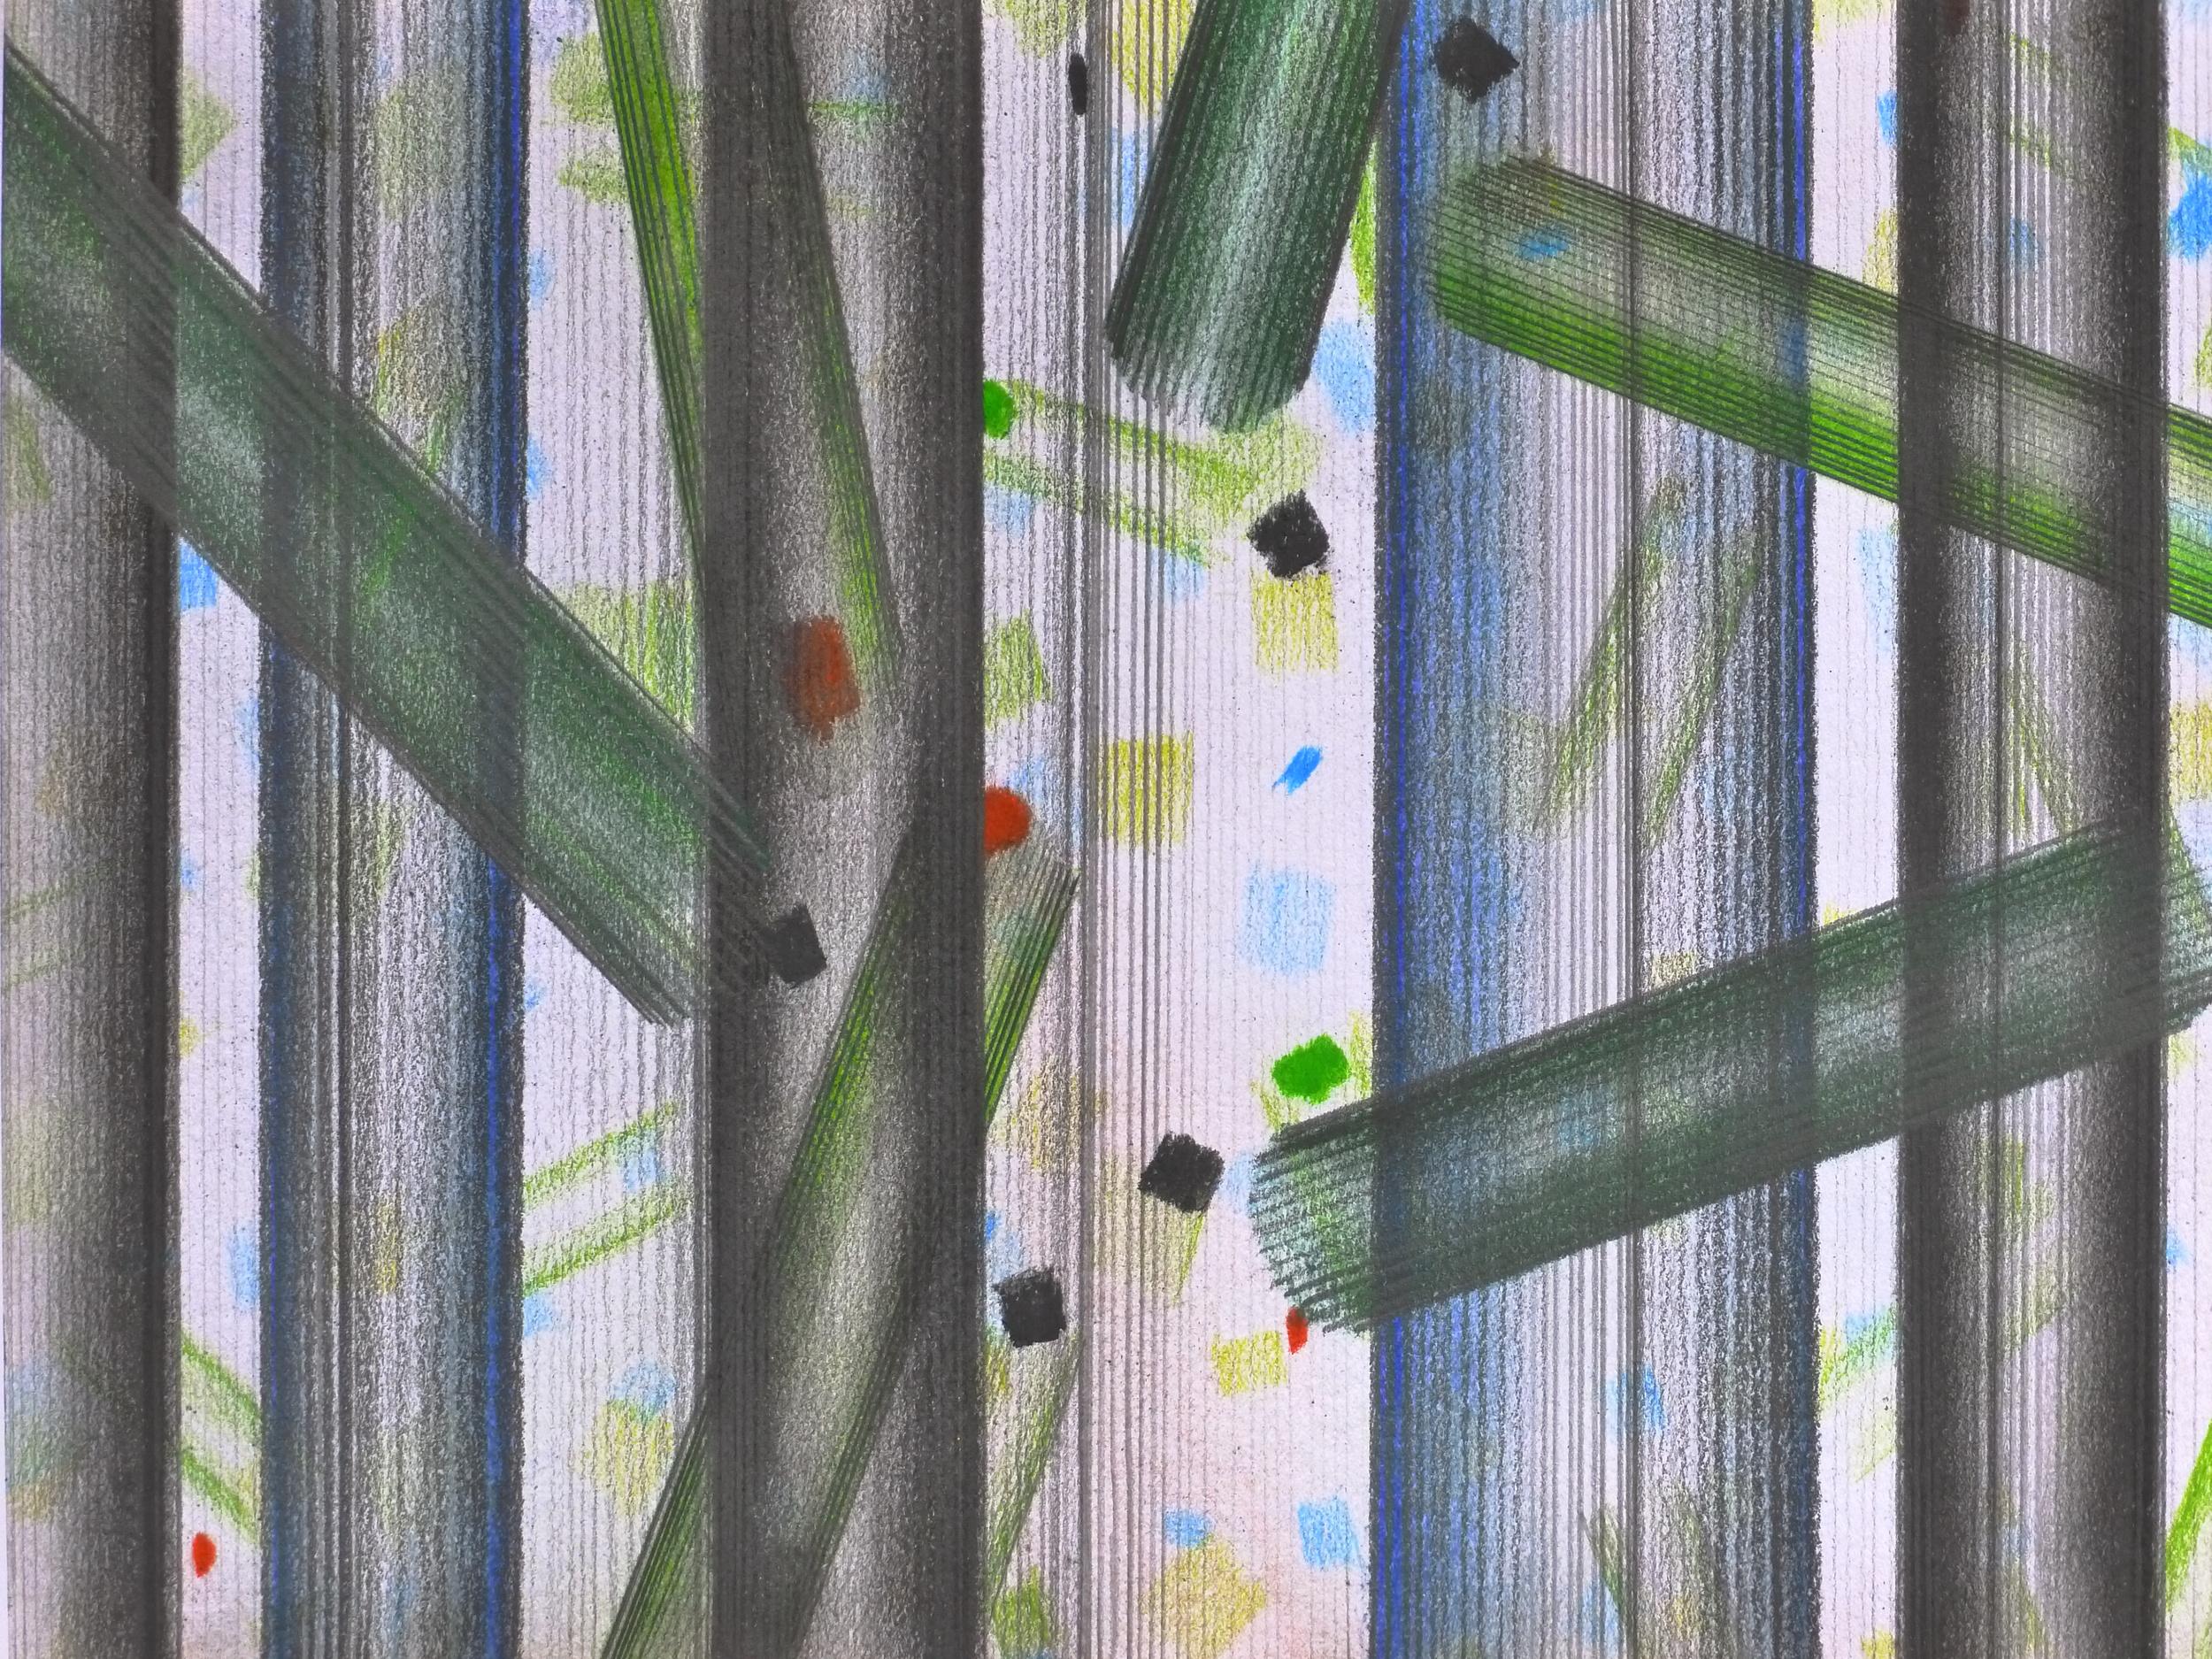 Jurgen Tarrasch, Falling, 2010, pastel on paper, 9 x 12 inches..JPG